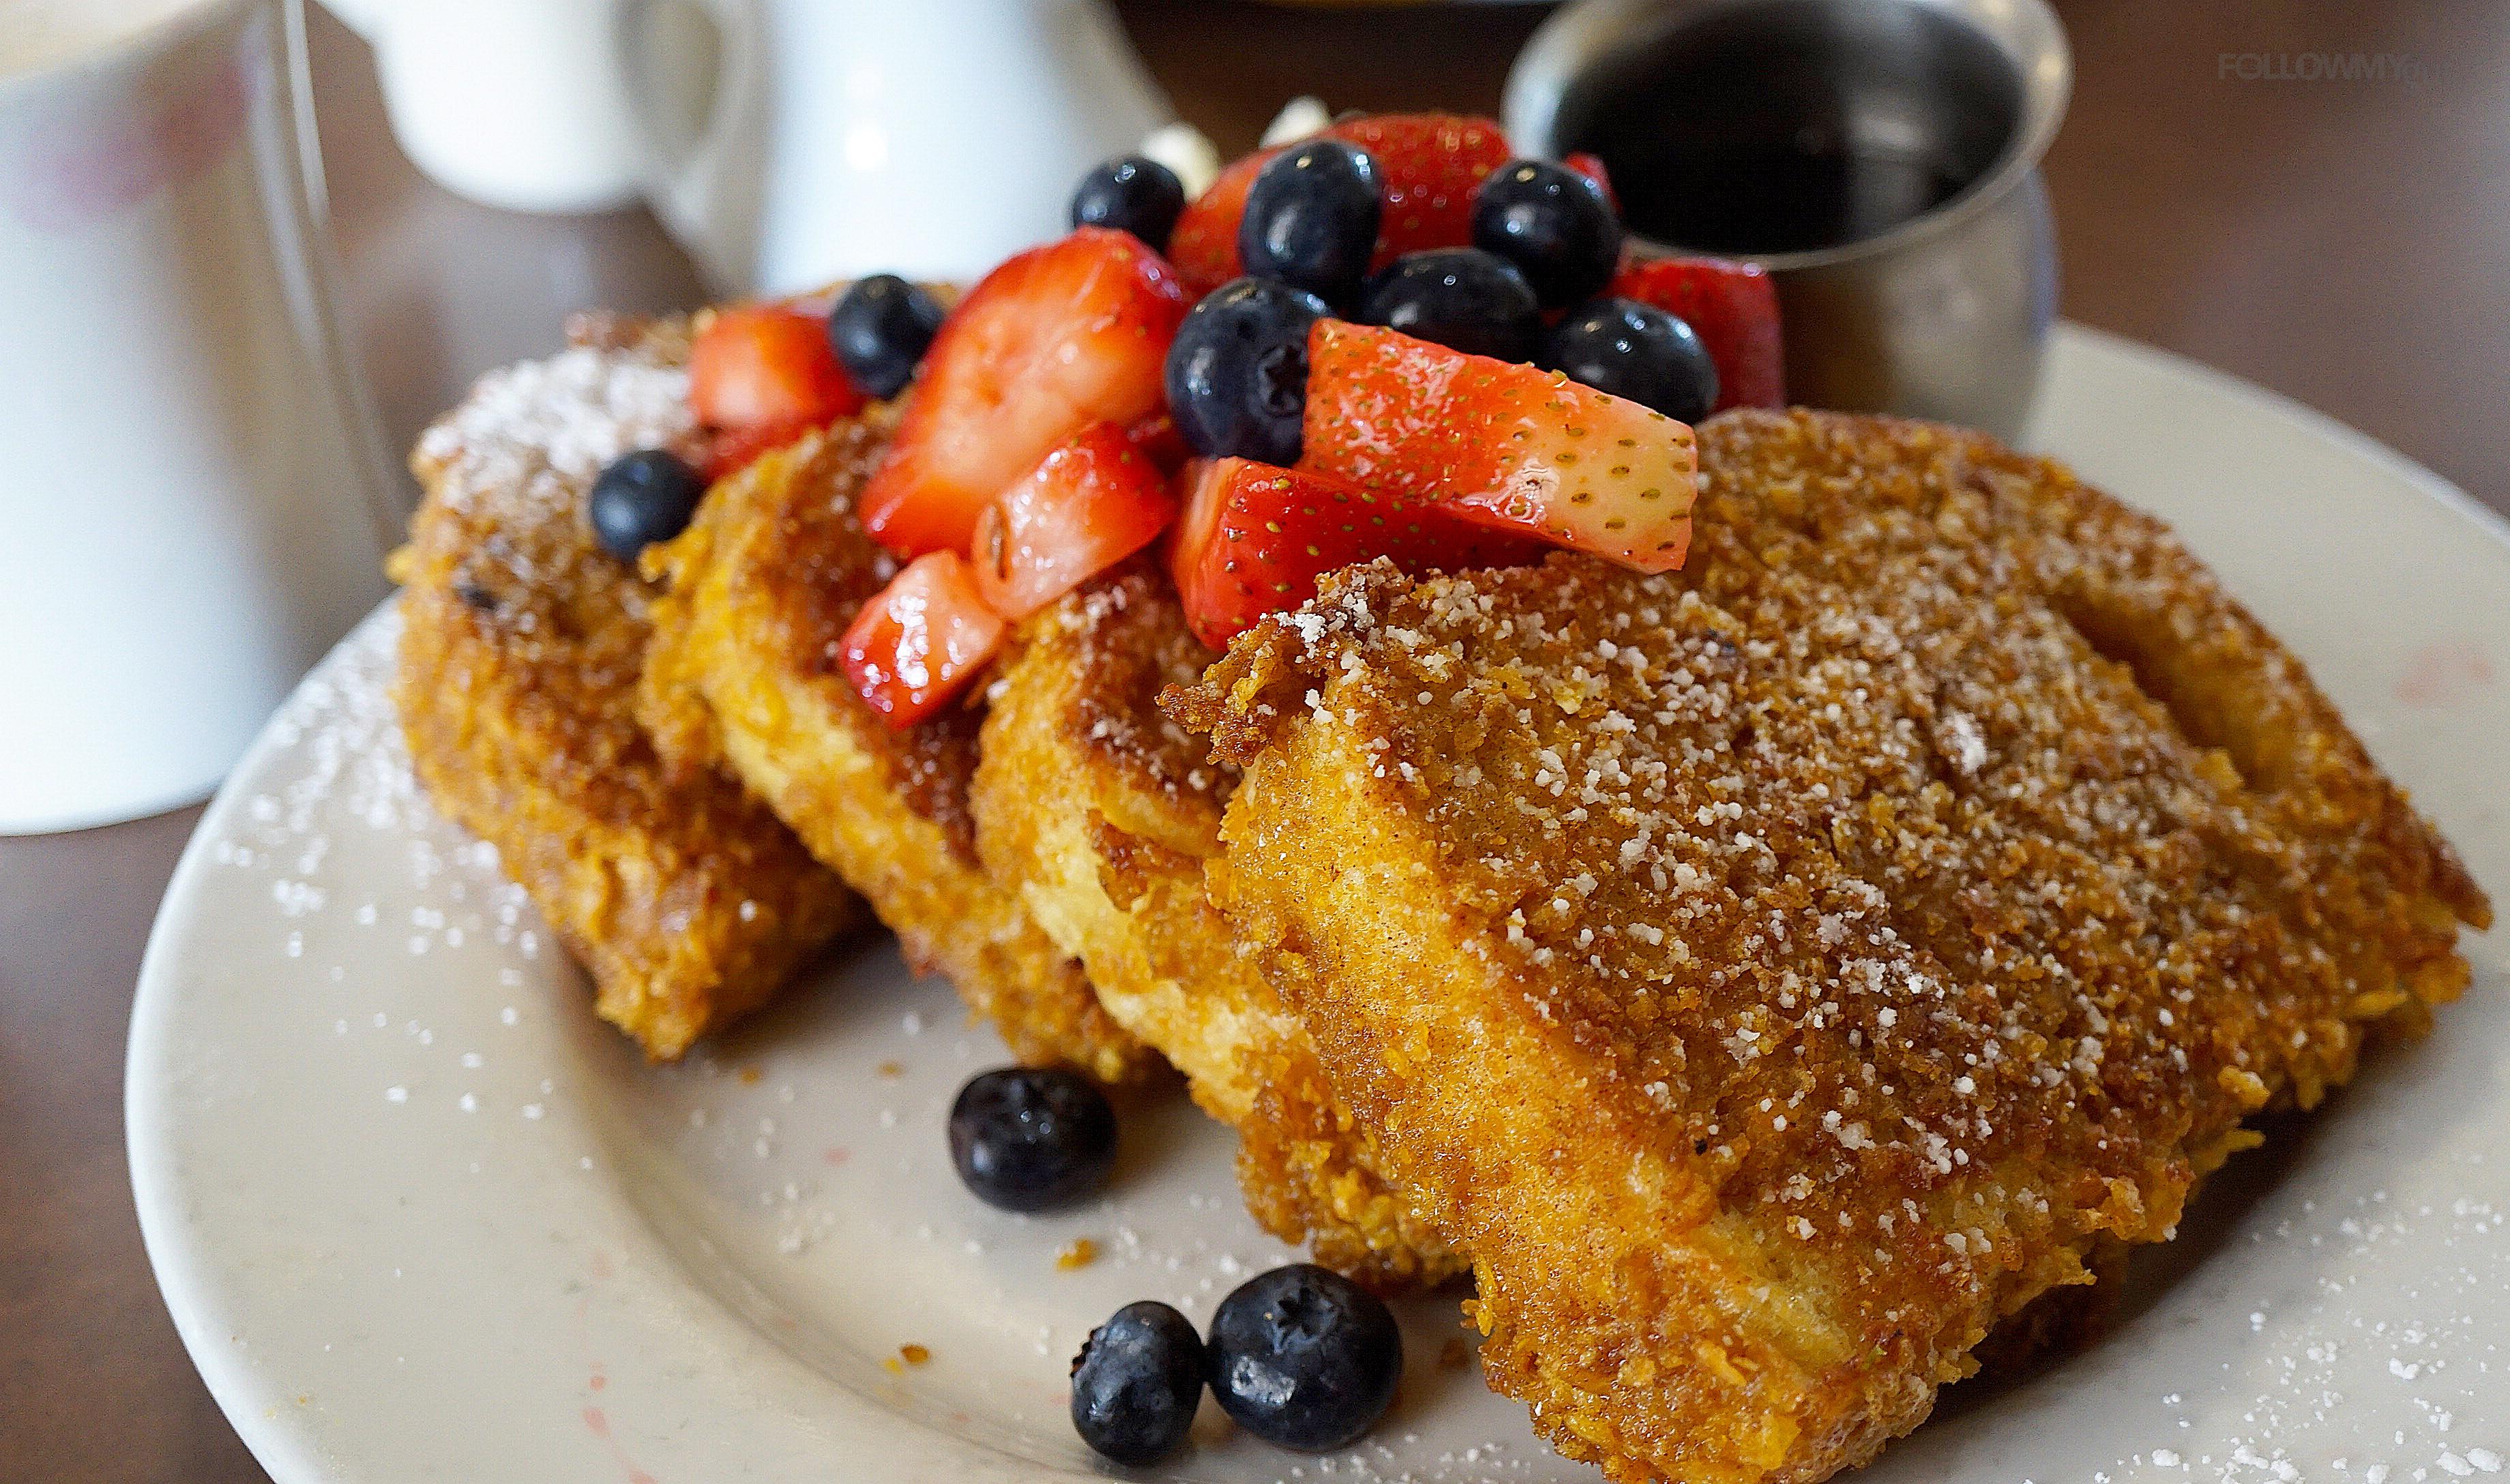 Follow My Gut, Fmg, Danielle N Salmon, Foodie, Blog, La